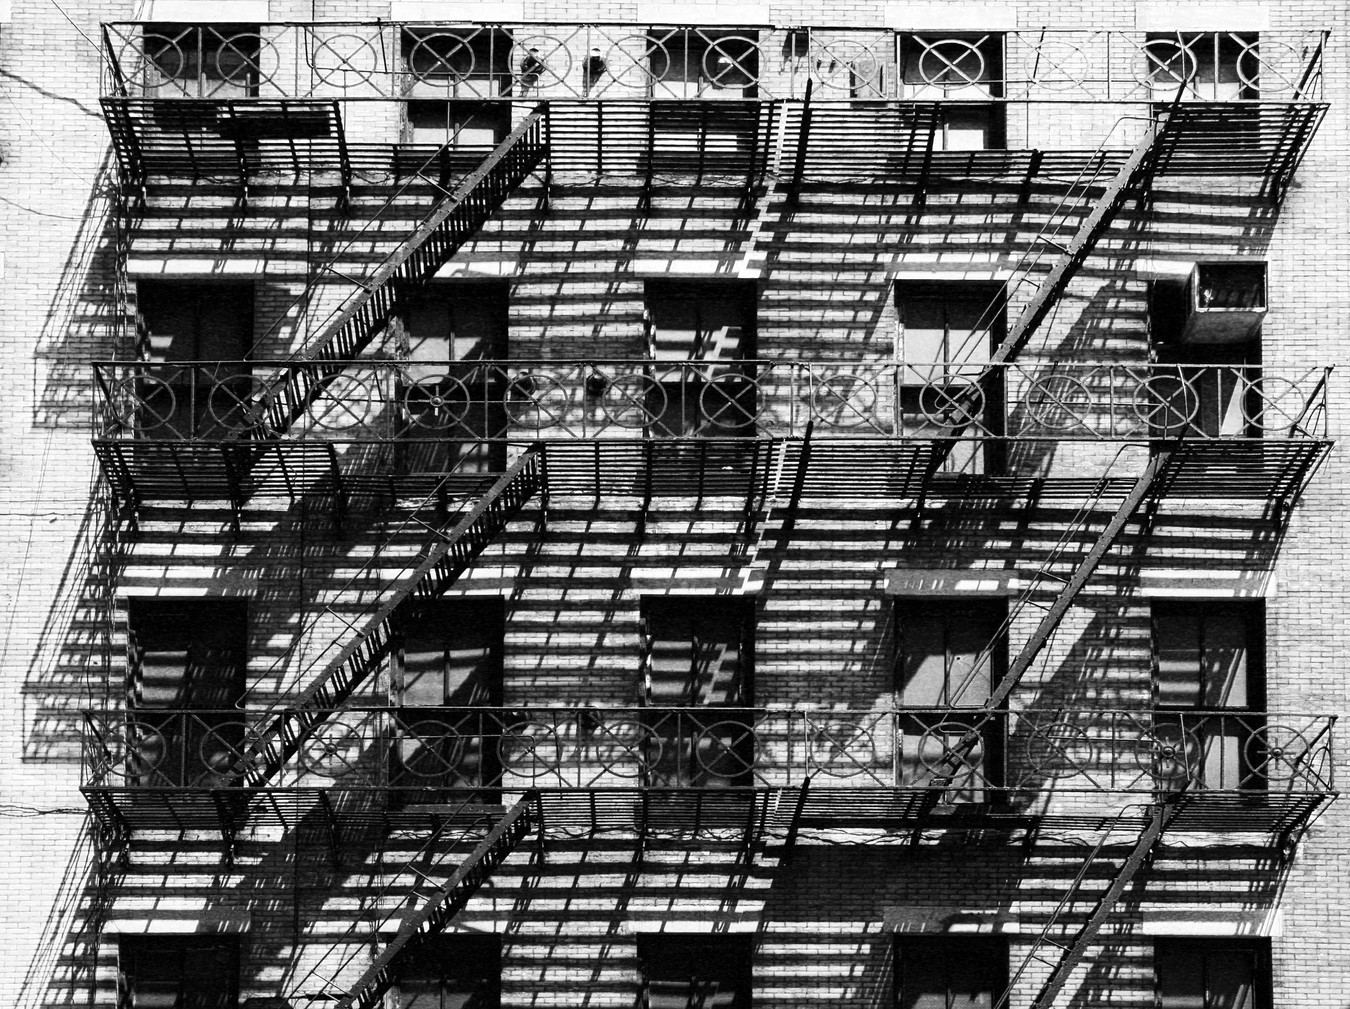 25_New York Polyphony, 2008, Fotografie,